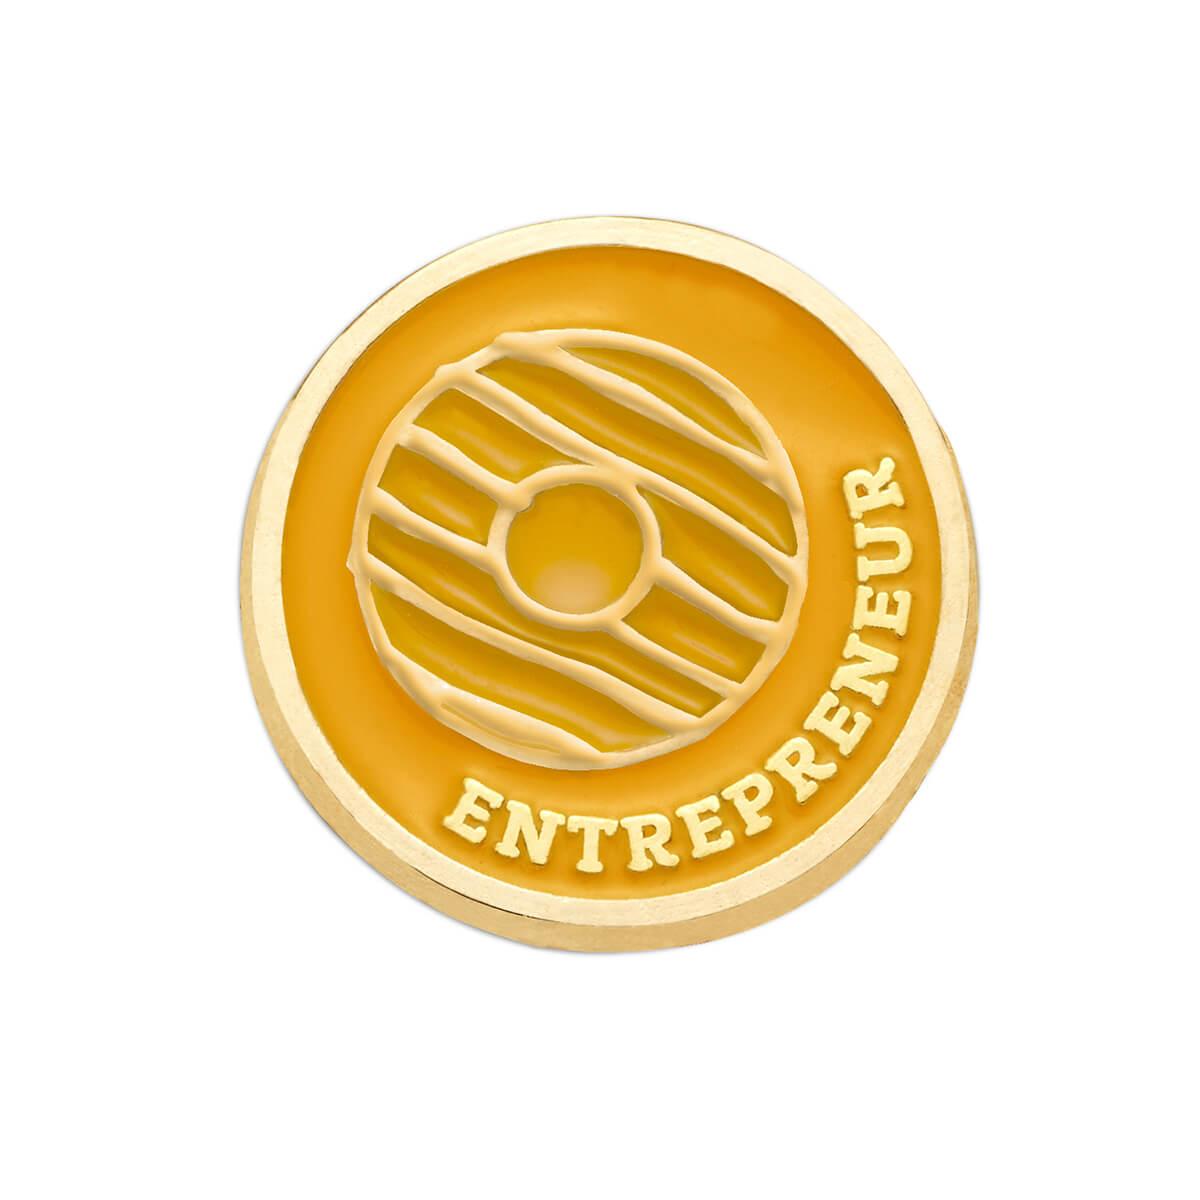 Ambassador Cookie Entrepreneur Fami